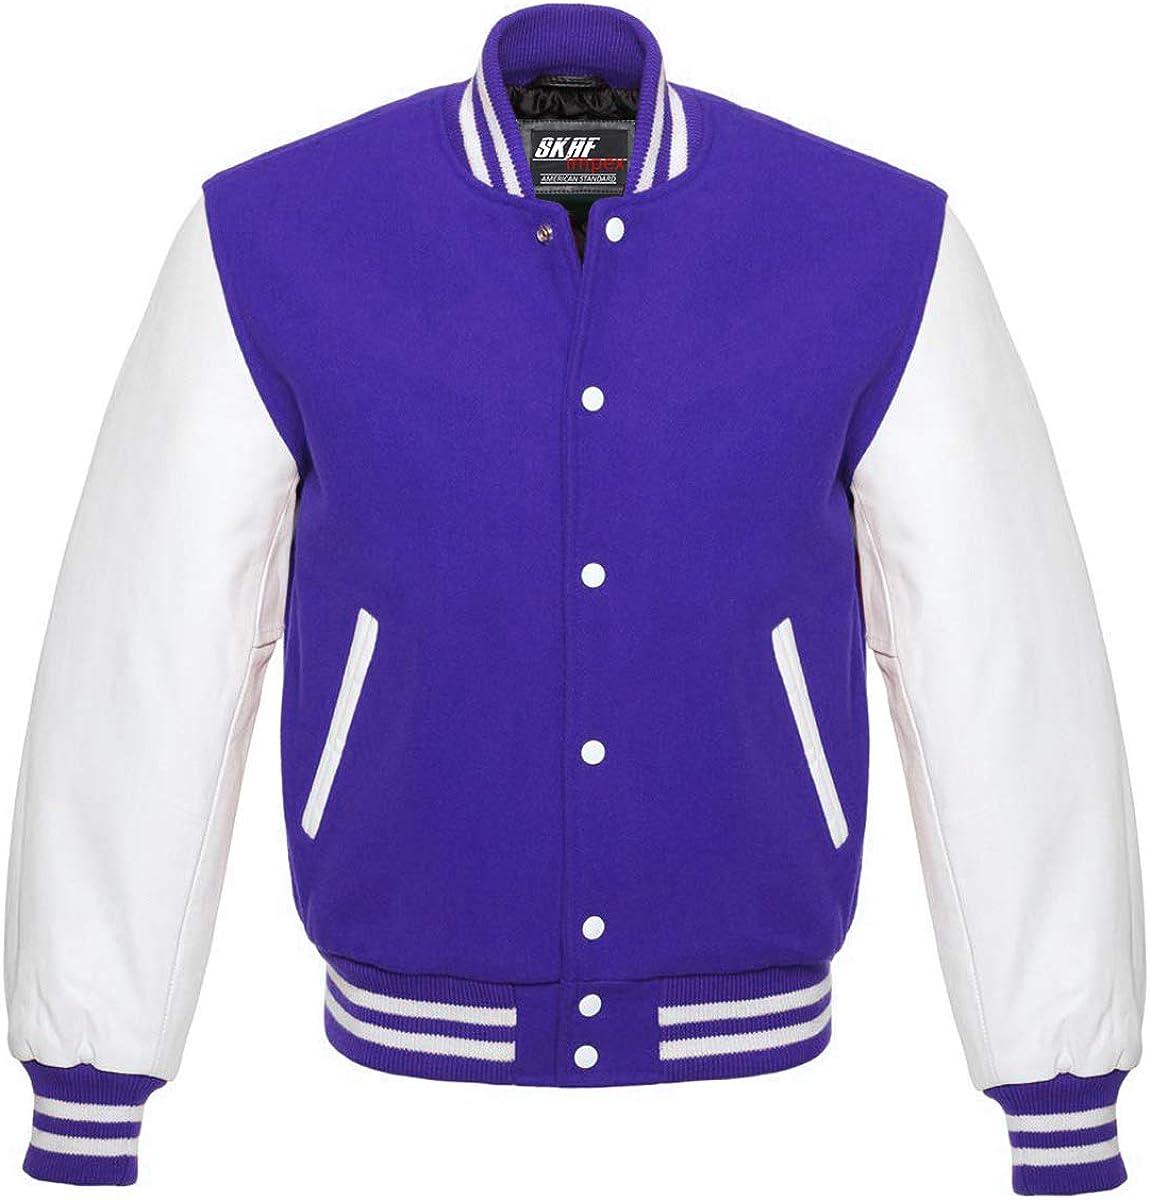 Skaf Impex Men's Letterman Baseball Max 53% OFF Jacket Varsity Leather Over item handling White